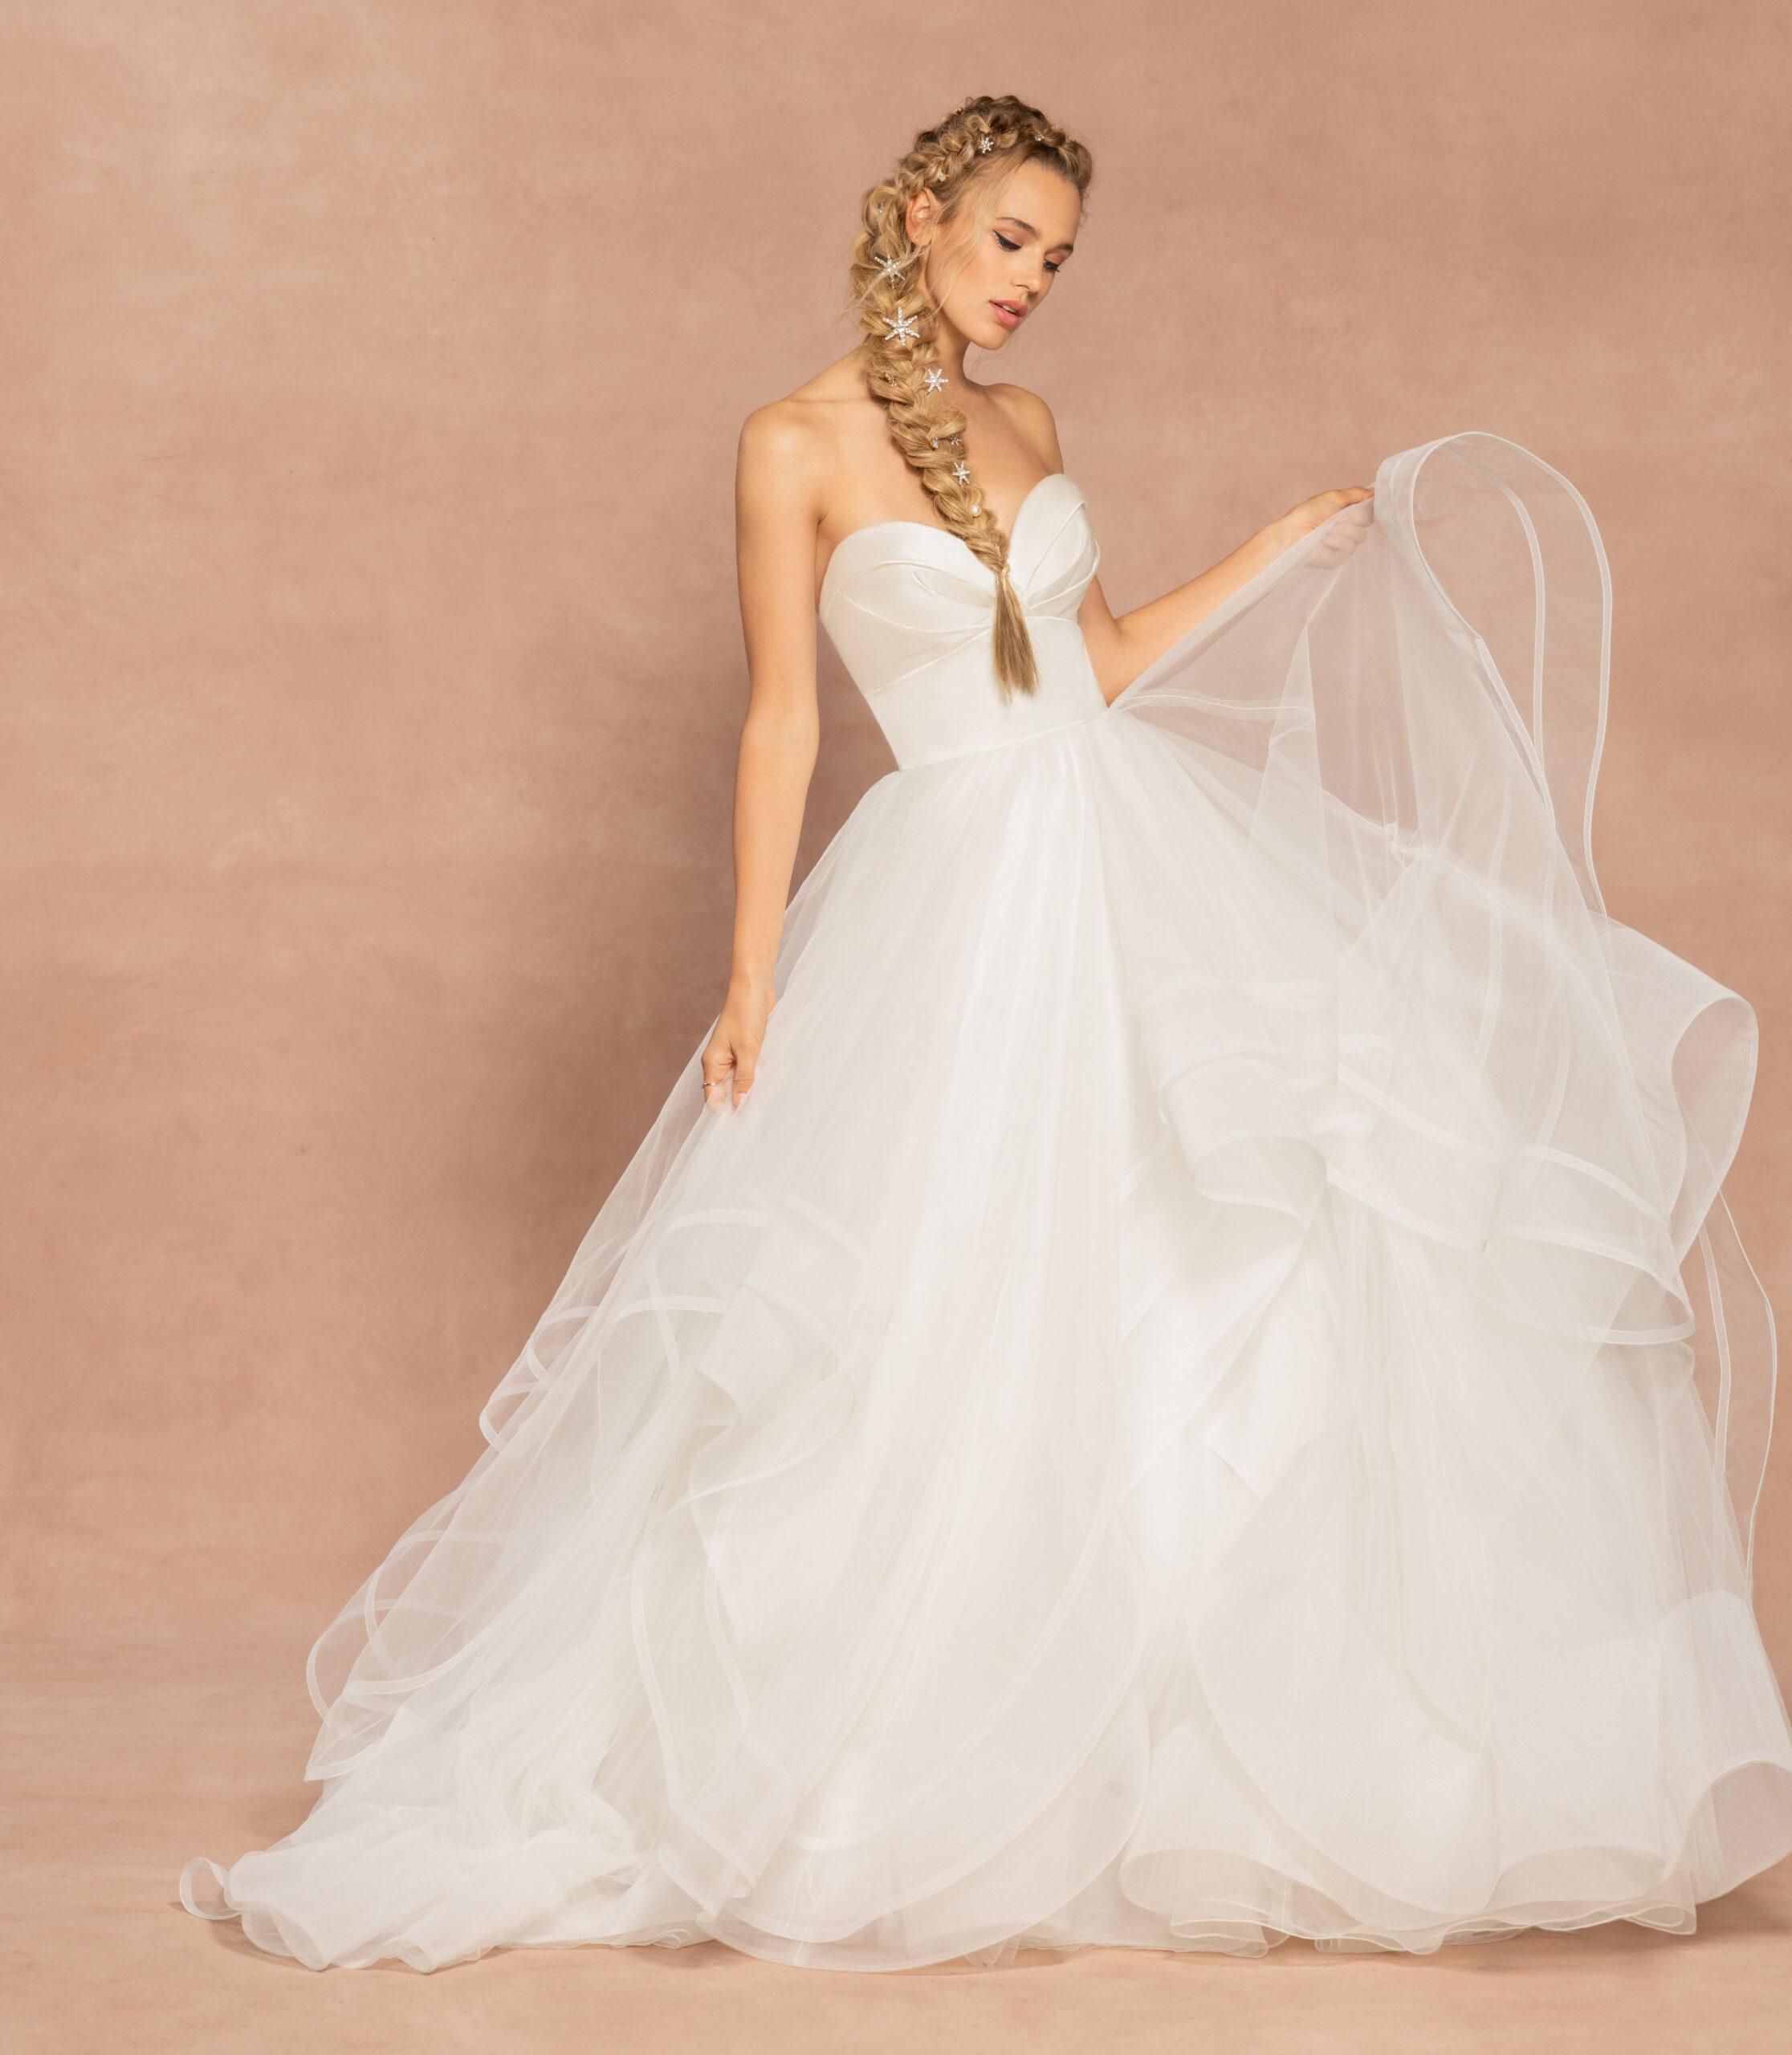 hayley-paige-bridal-spring-2020-style-62005-loretta_7